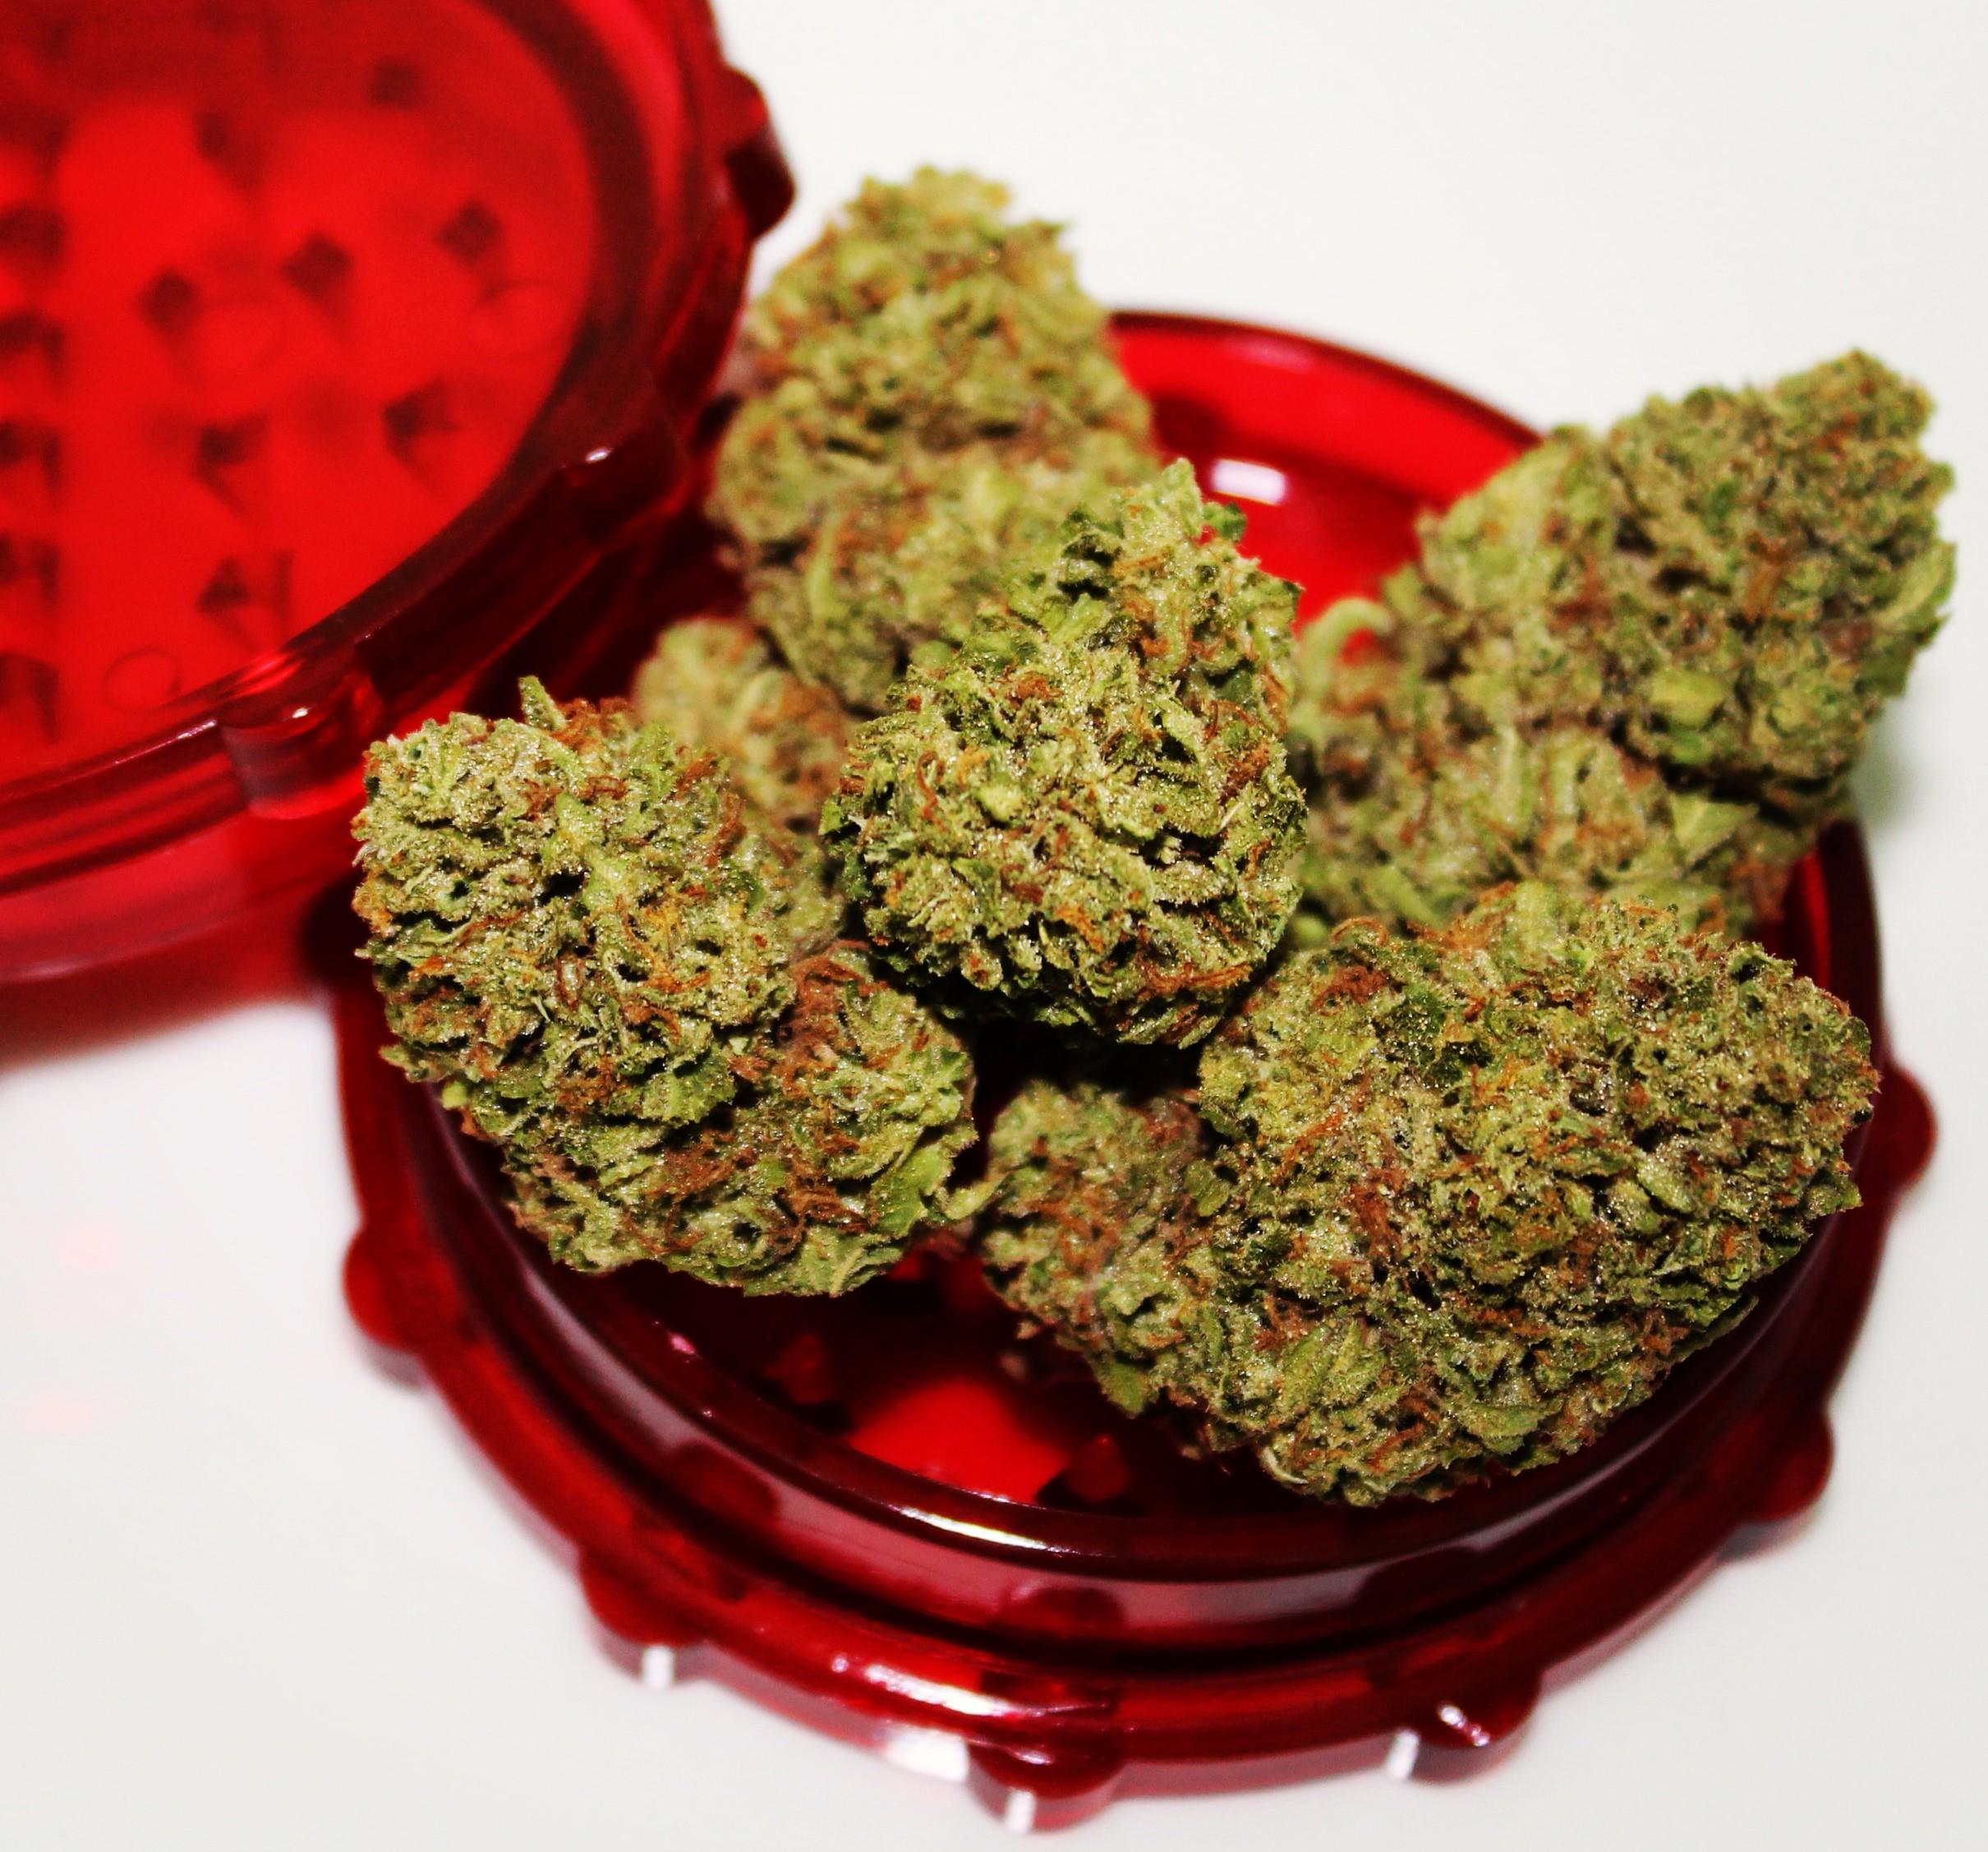 Cherry OG grown by Cascade Valley Cannabis